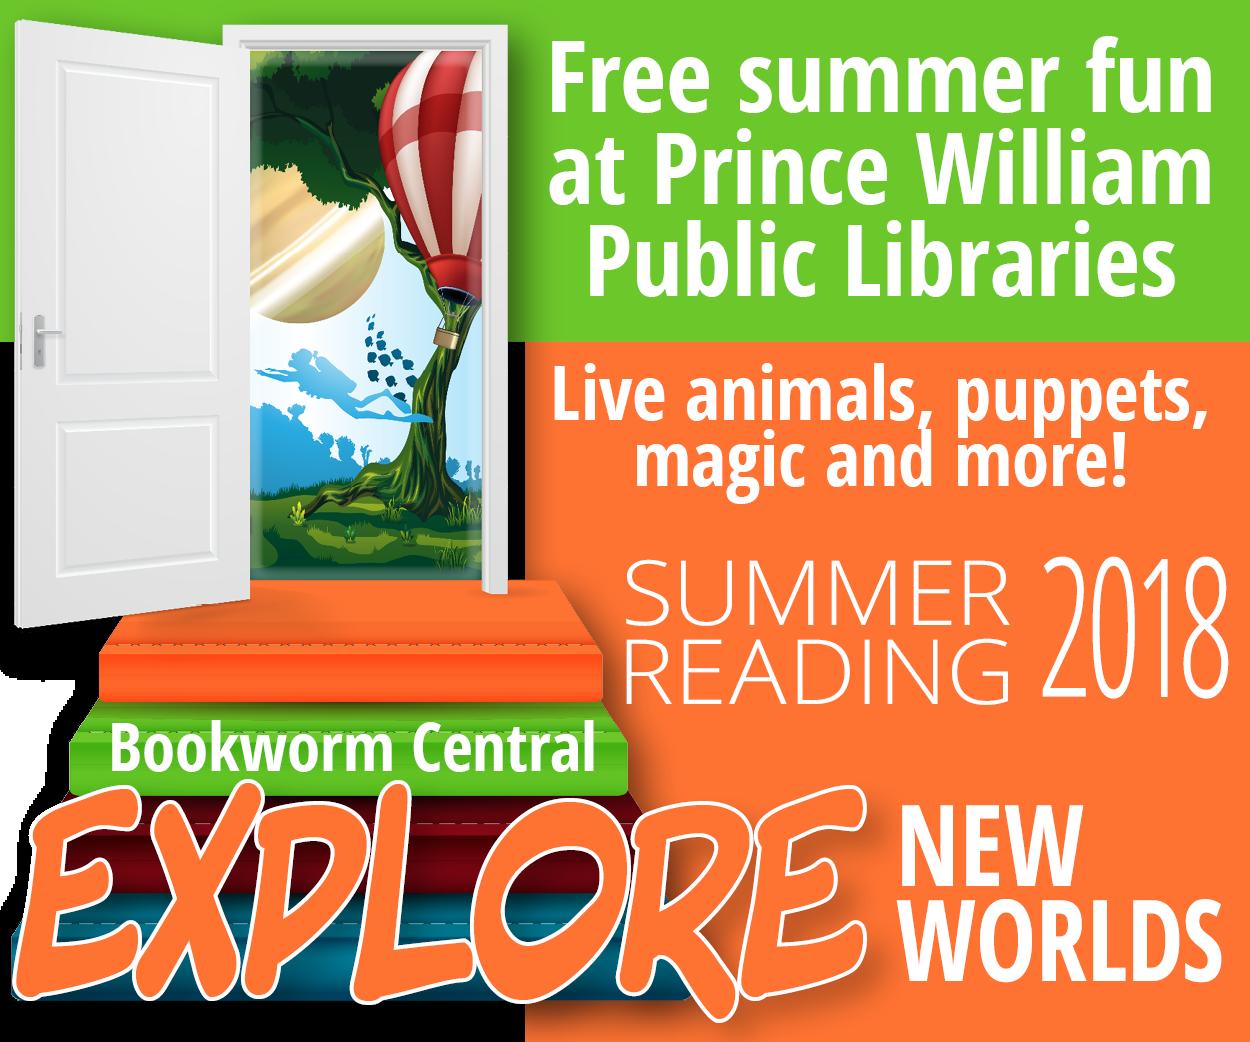 2018 Summer reading program, PWPLS, Explore New Worlds